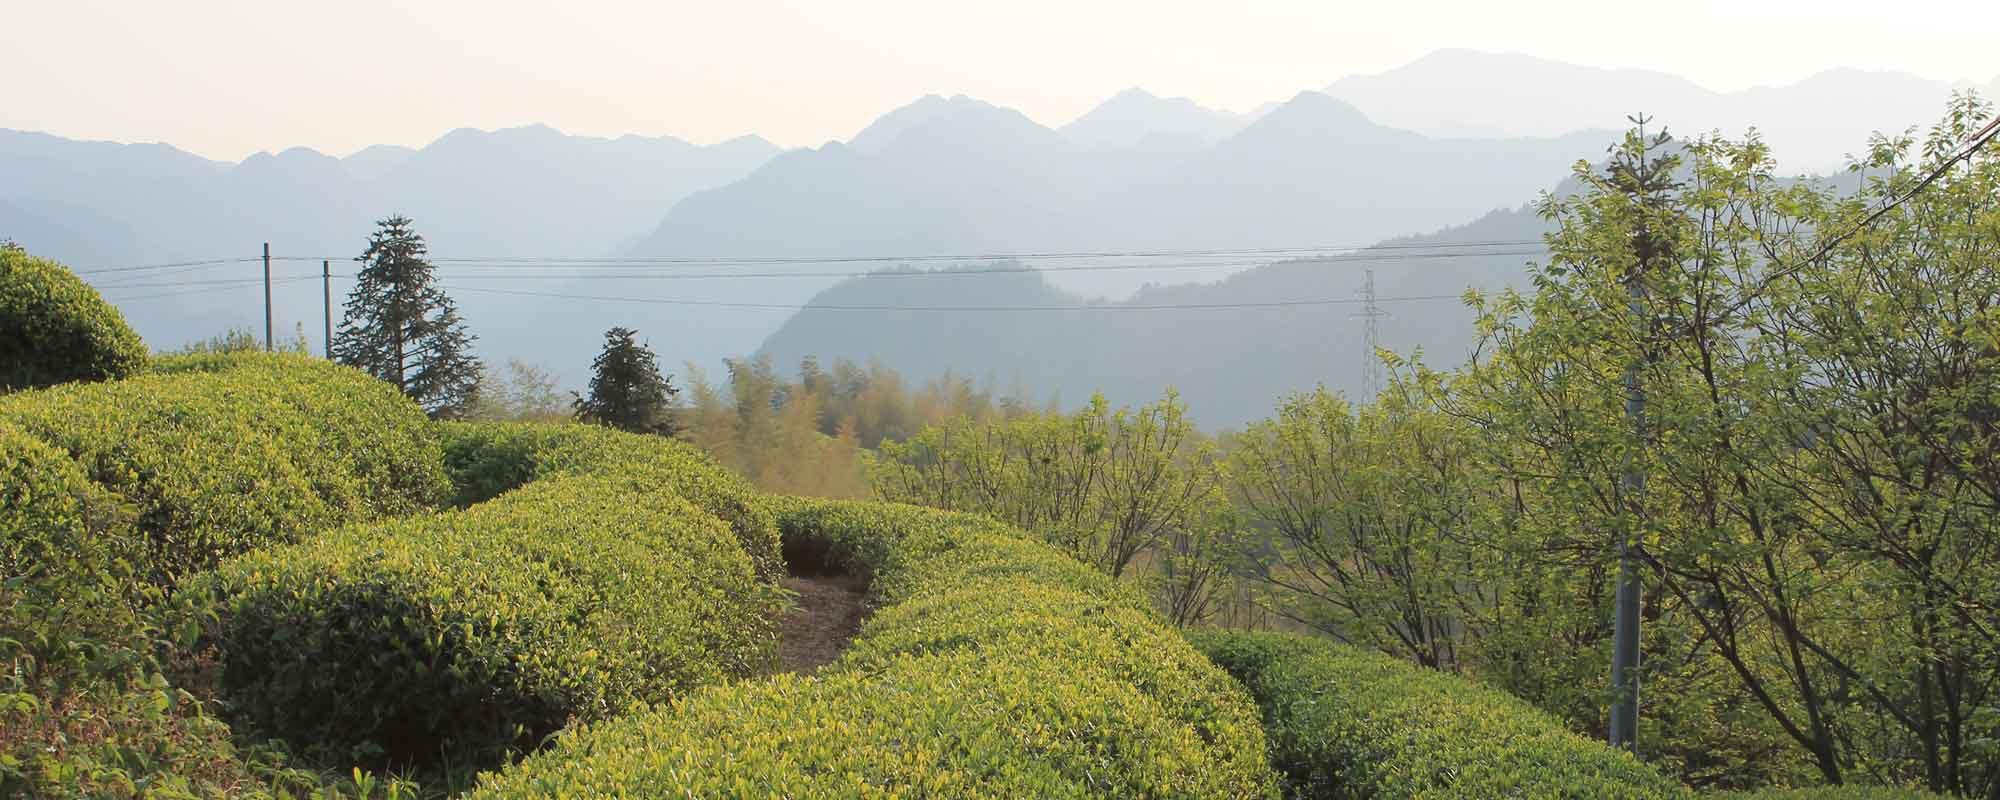 Chinese Tea Garden in Spring